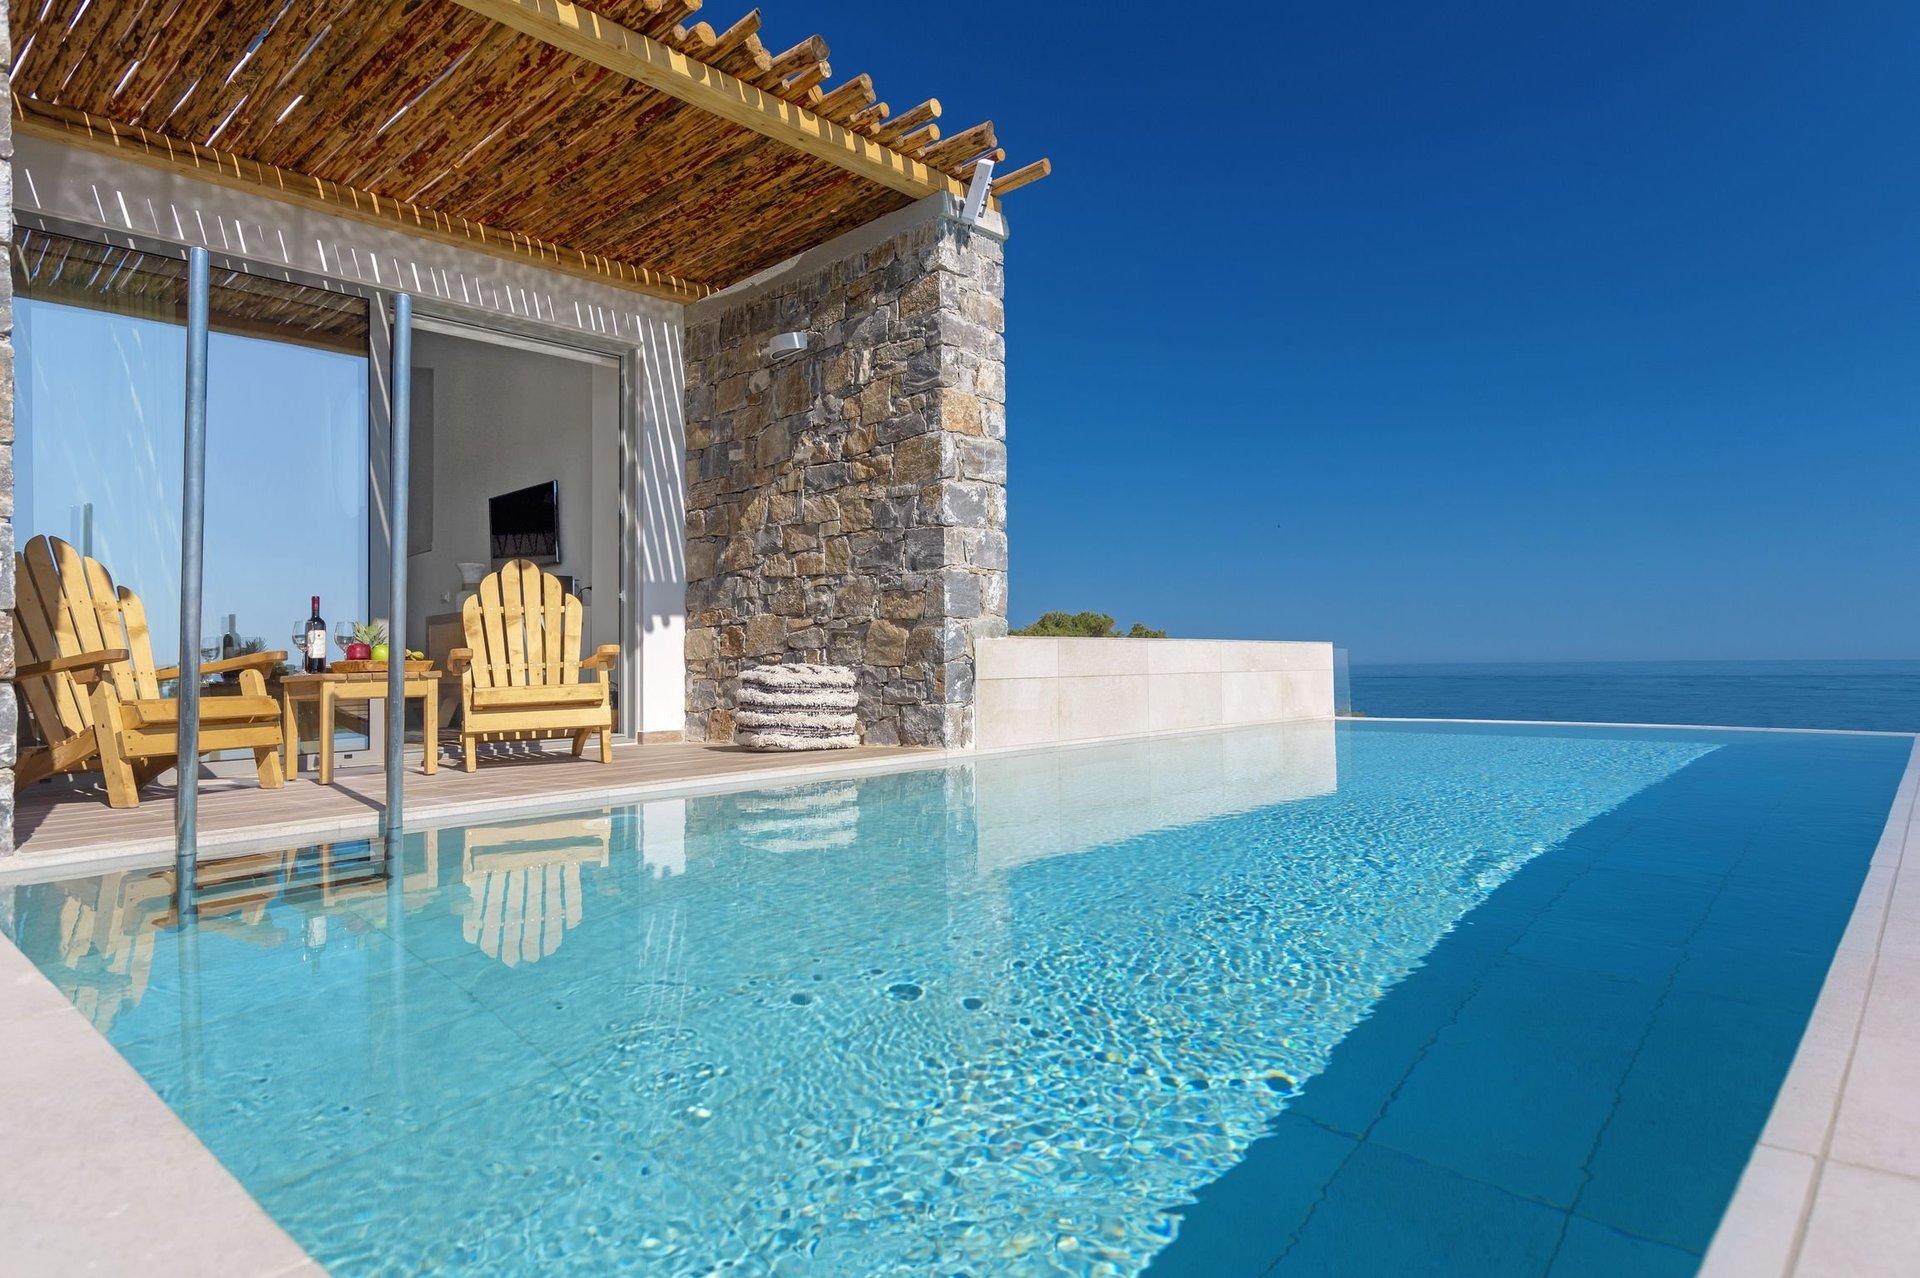 Hotel Atermono Boutique Resort & Spa - Rethymnon - kamer-deluxe suite - privé zwembad